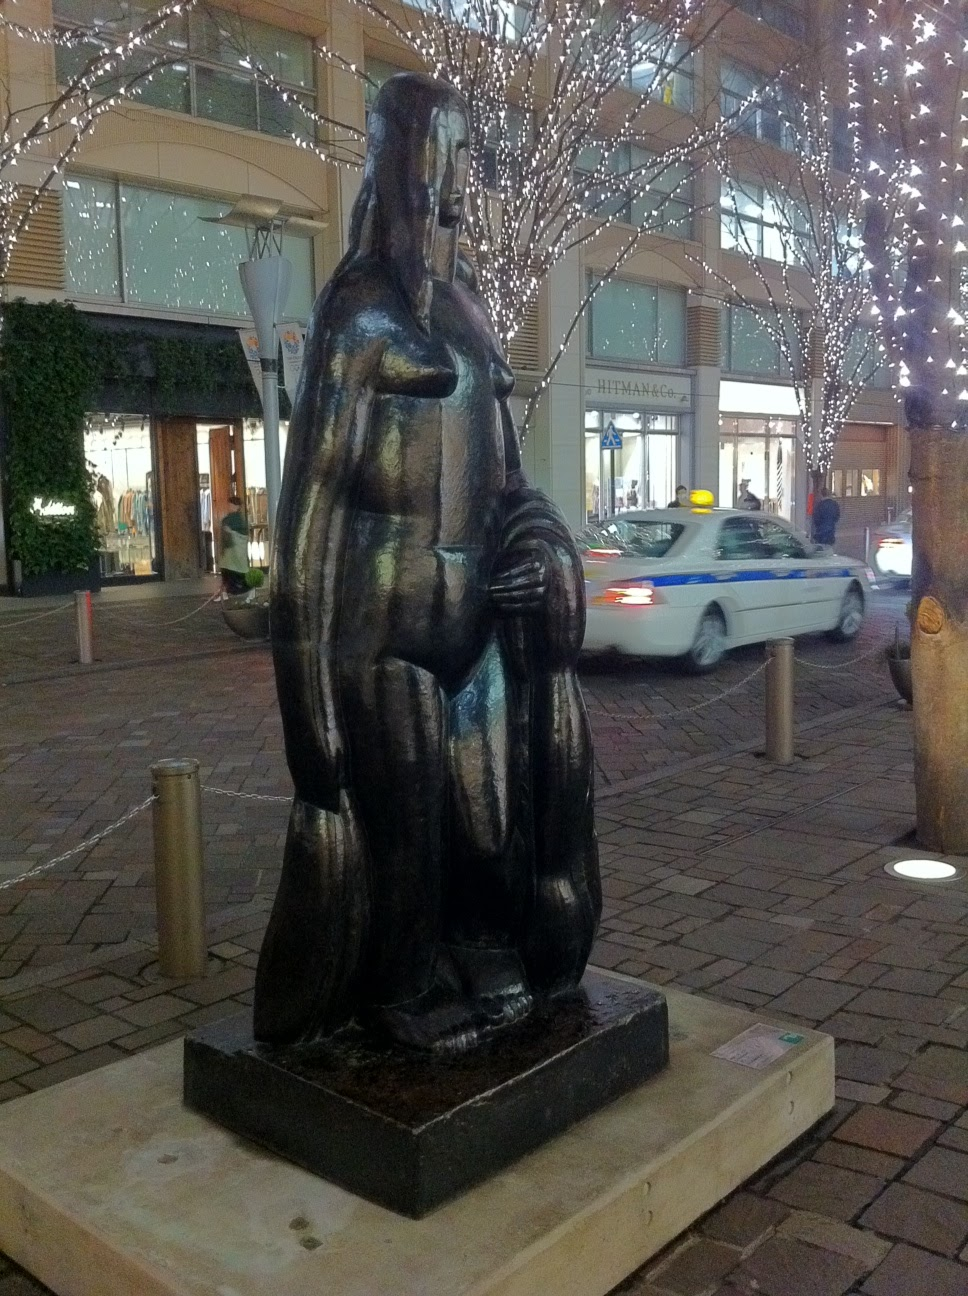 Henri Laurens sculpture, Femme Debout, in Marunouchi, Tokyo.